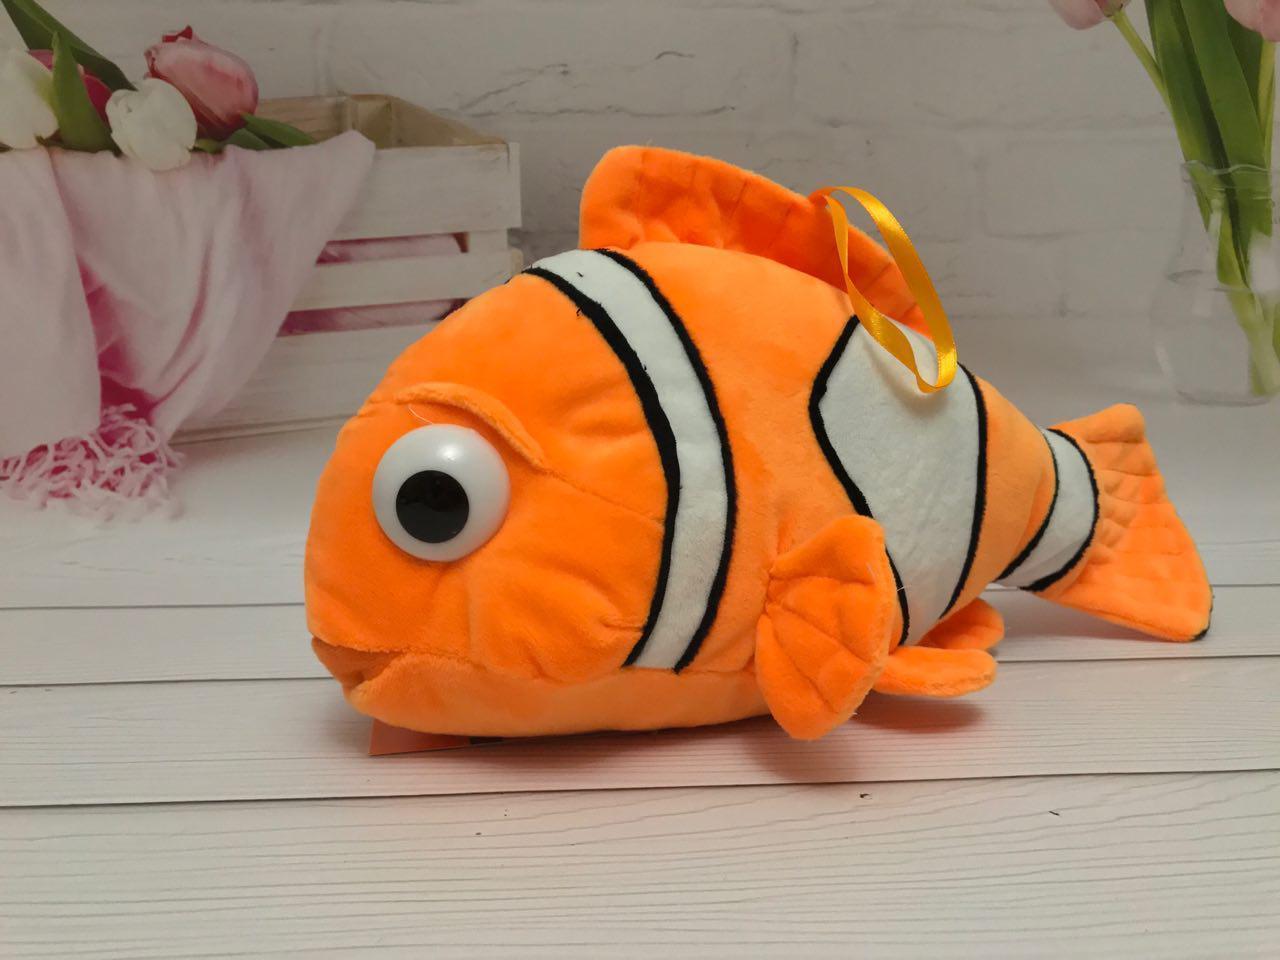 М'яка плюшева іграшка Рибка-клоун 38см